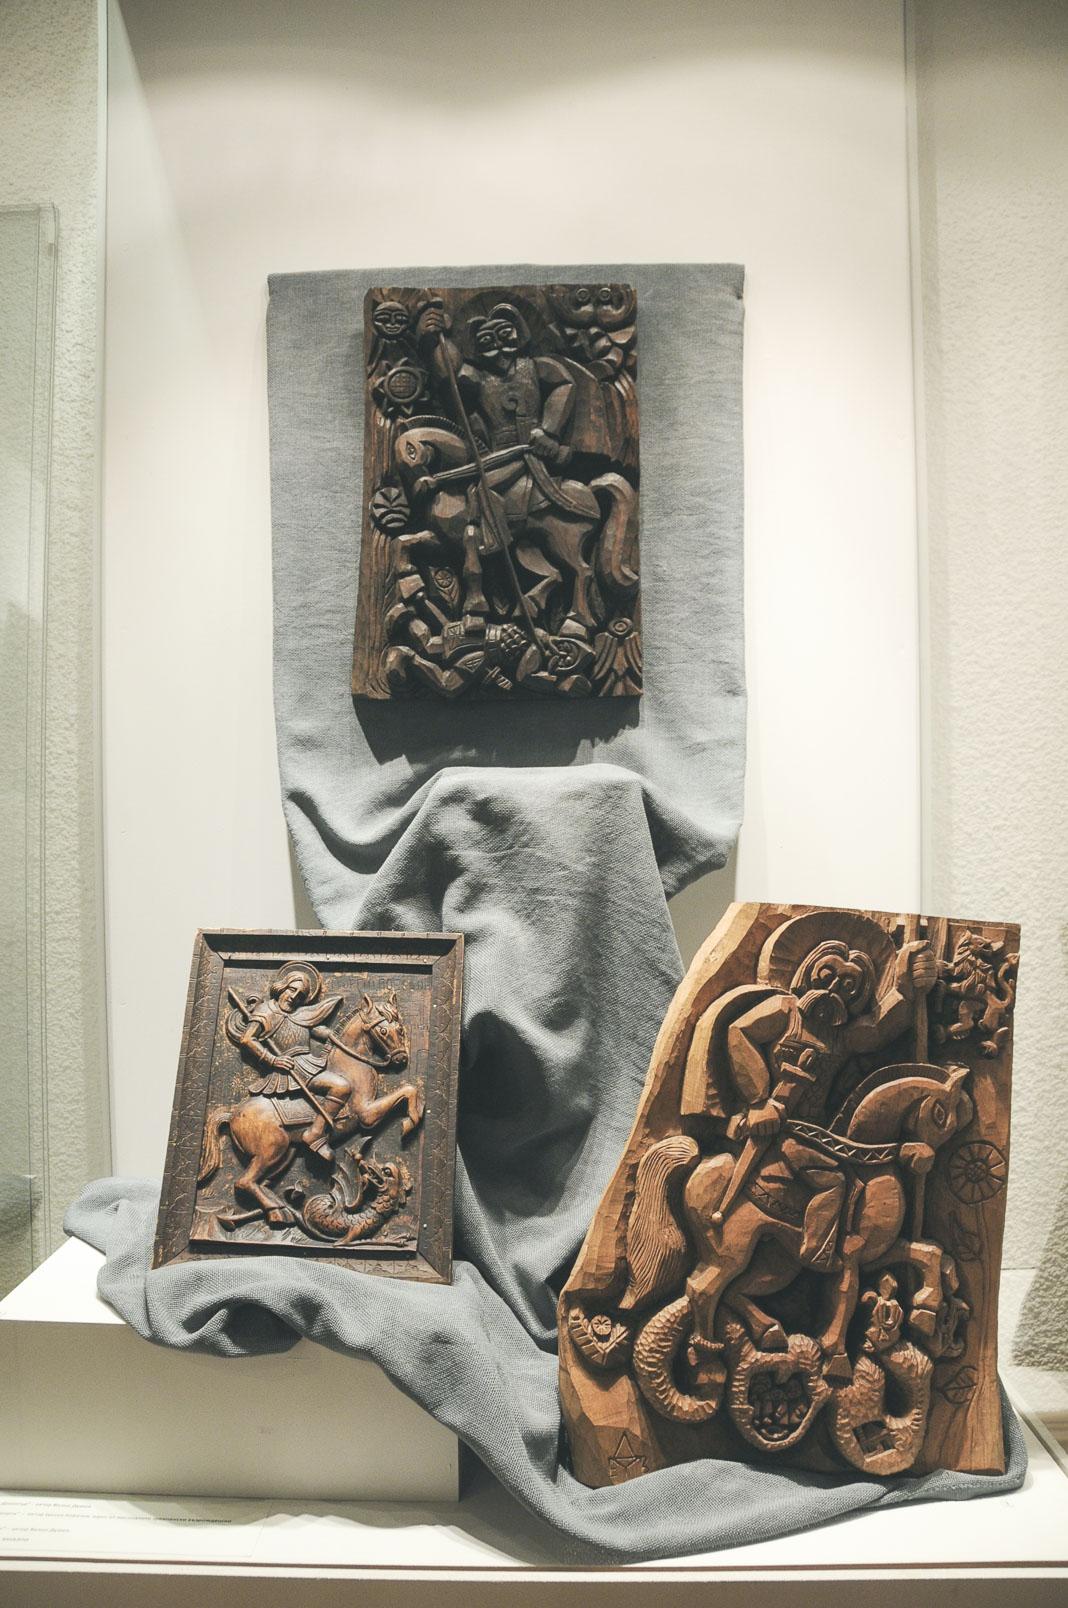 troyan-museum-jivotat-na-edna-idea-8